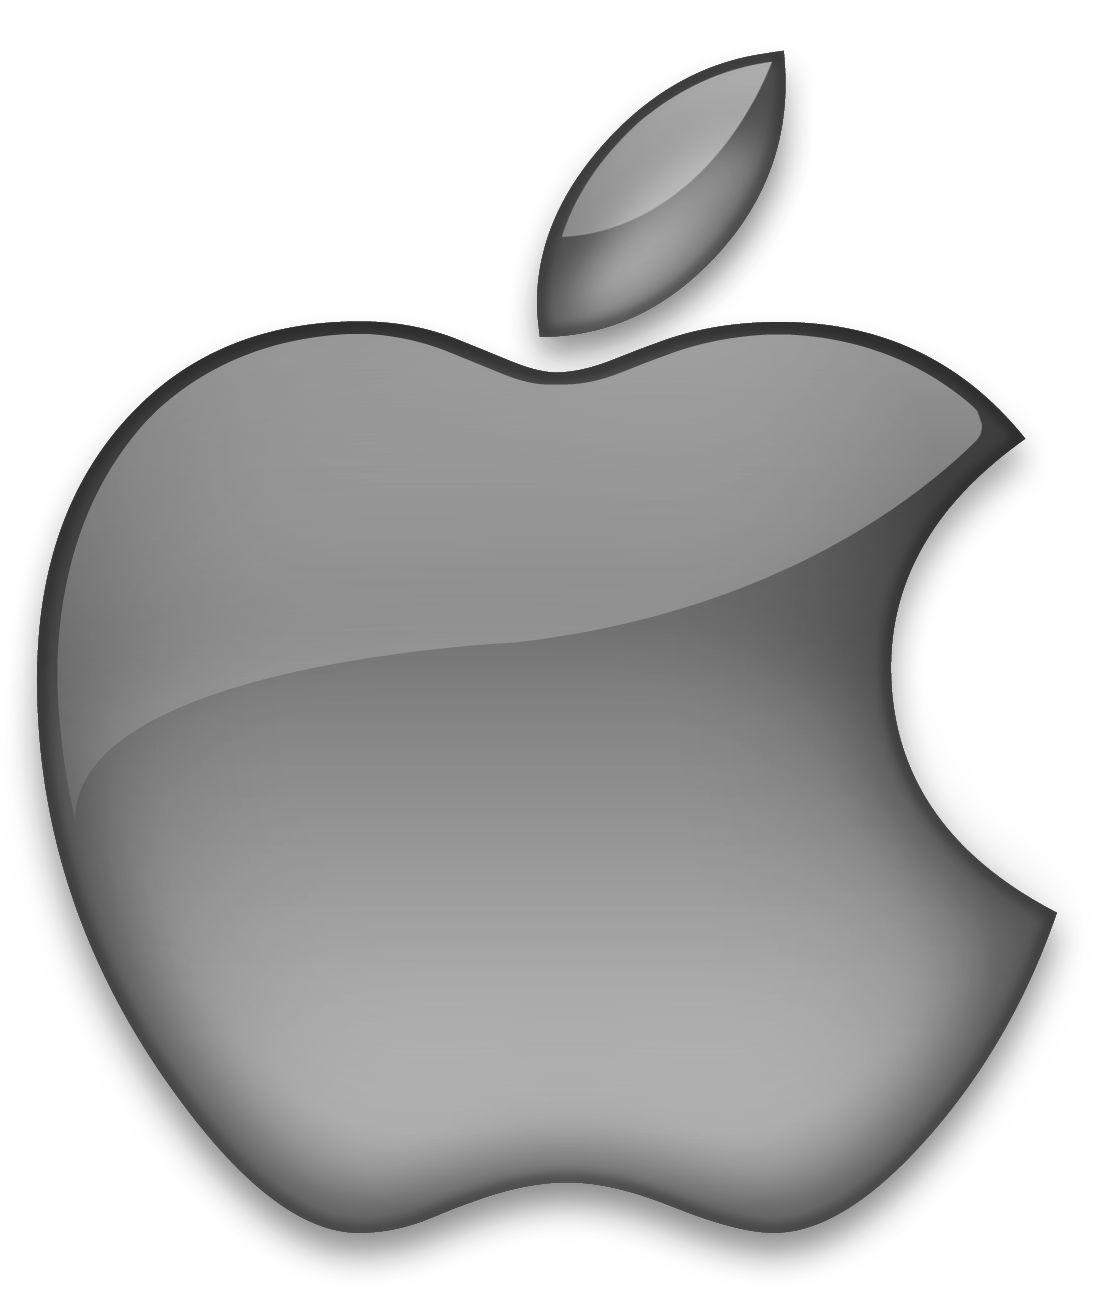 Thursday News: Apple claims 20% of ebook market